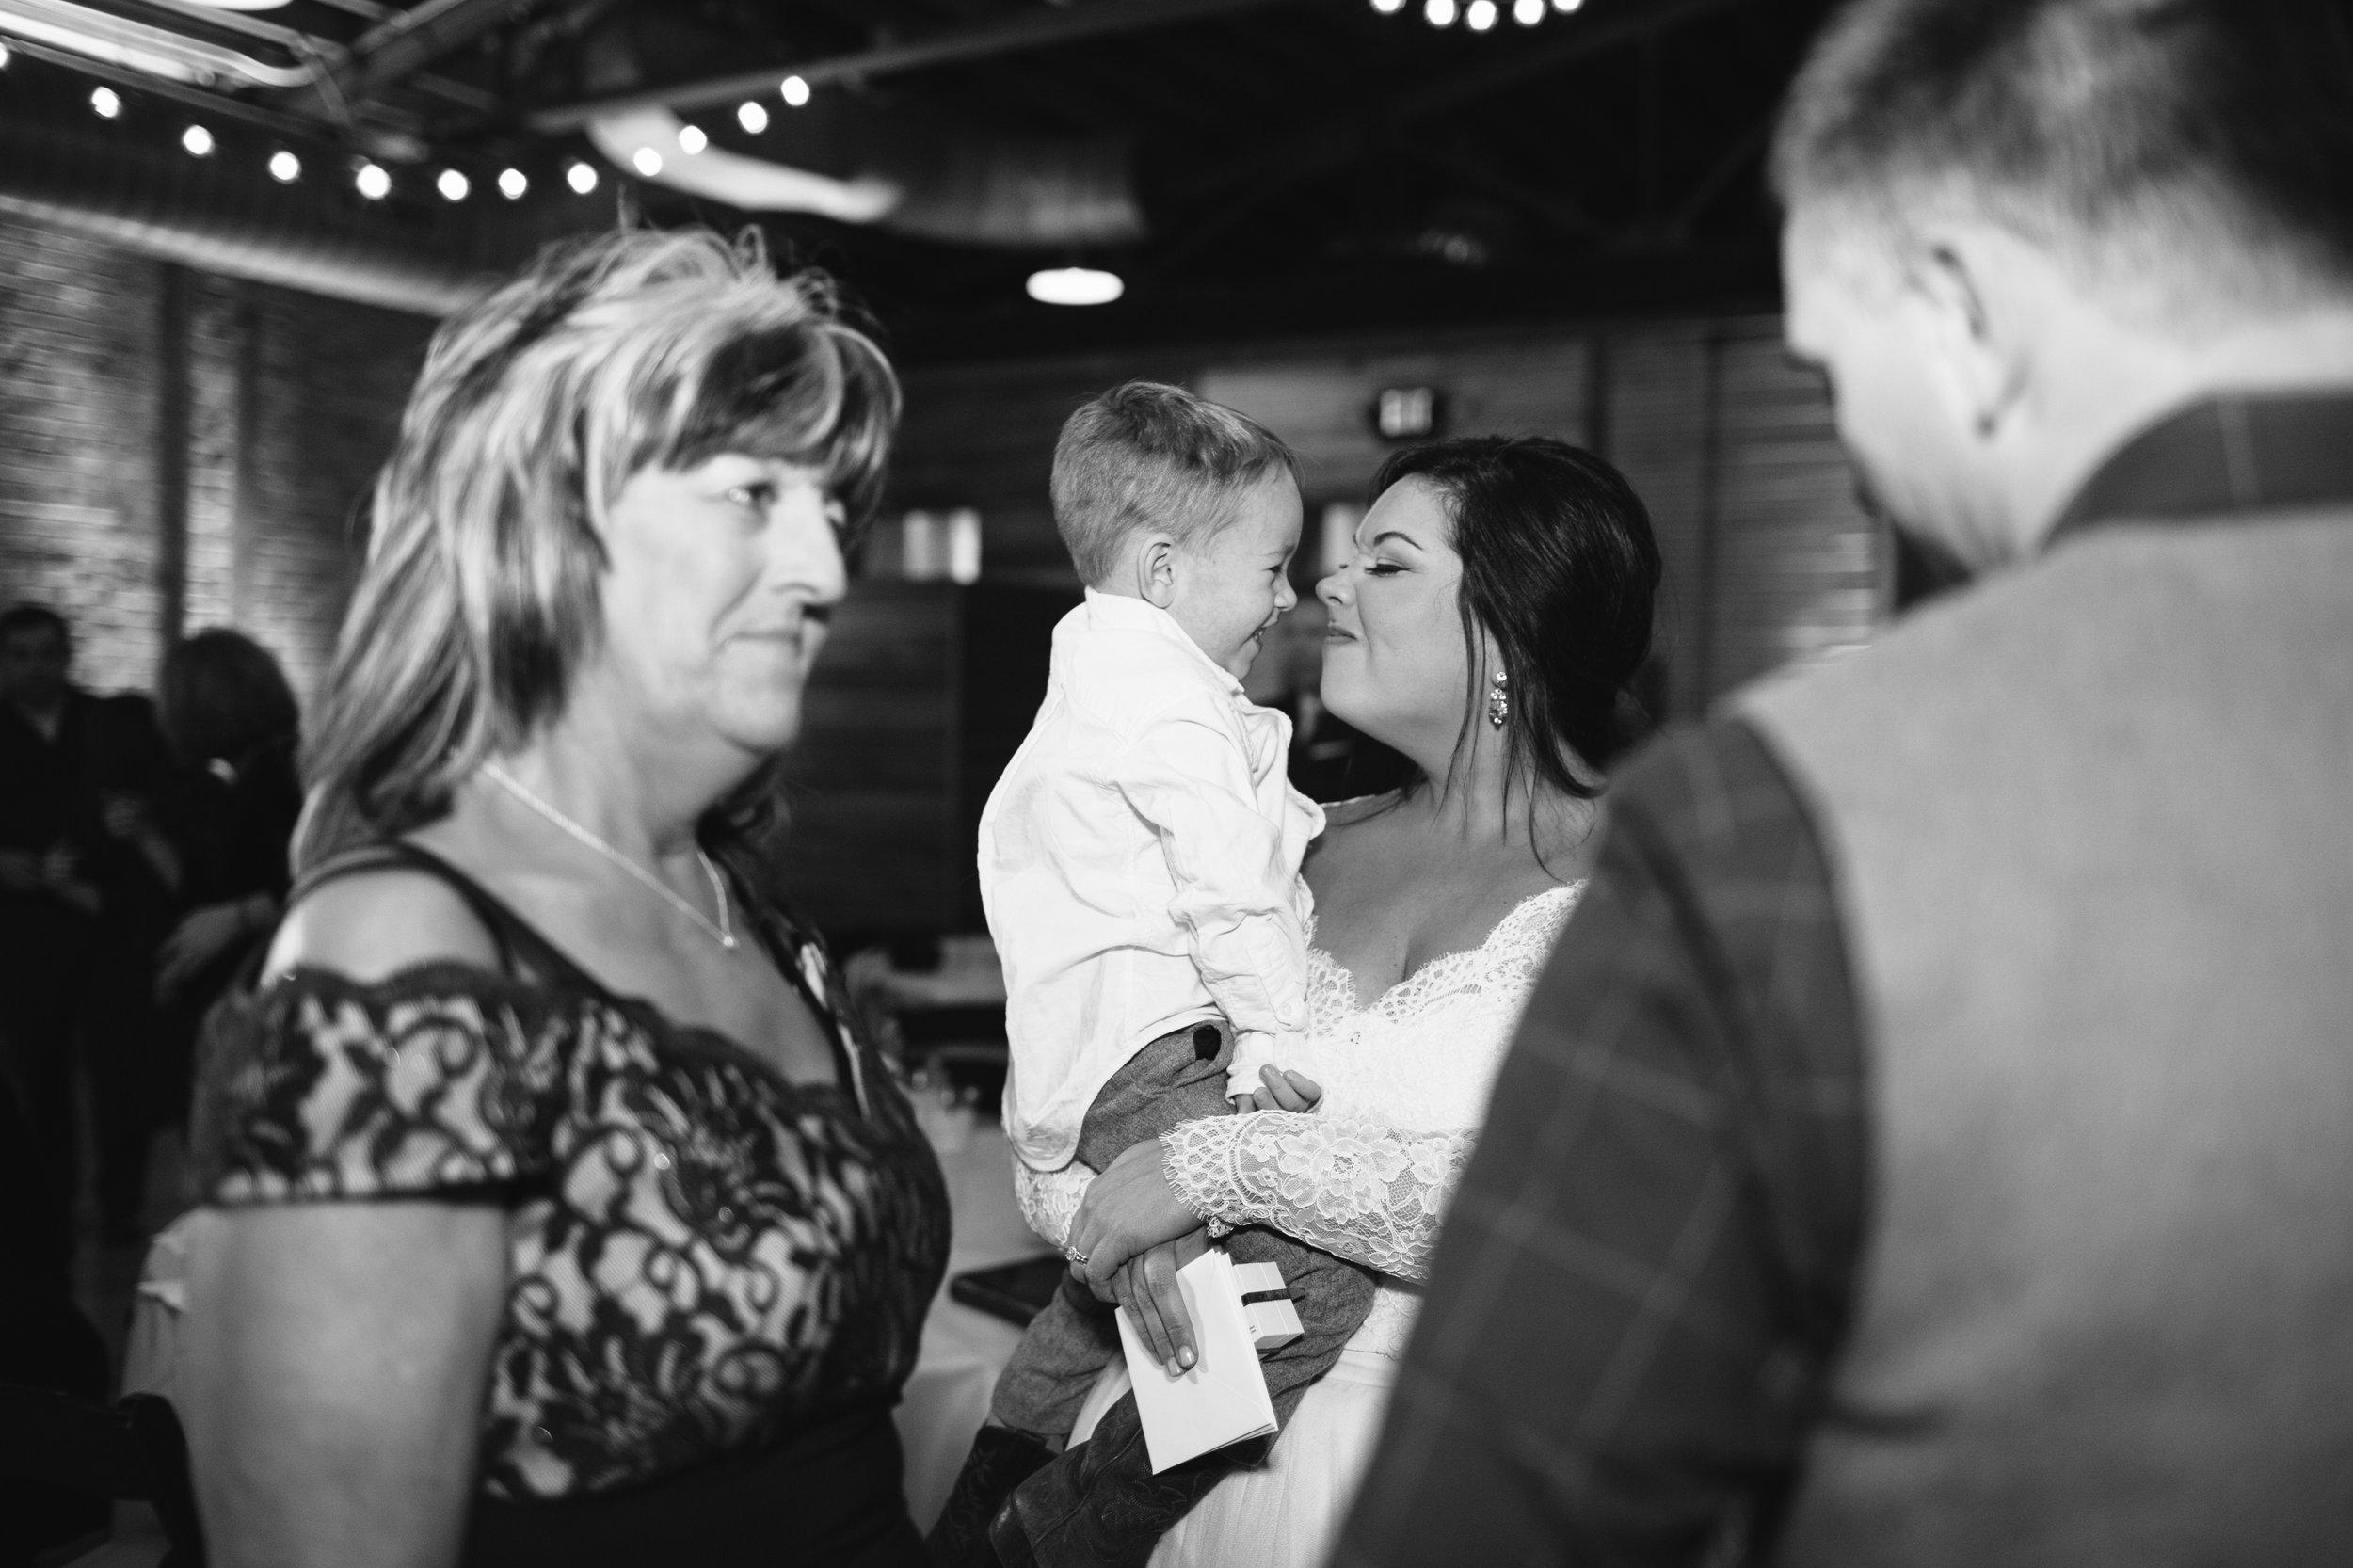 Lauren_Jeremy_Standard_Wedding_Knoxville_Abigail_Malone_Photography_FIlm-602.jpg